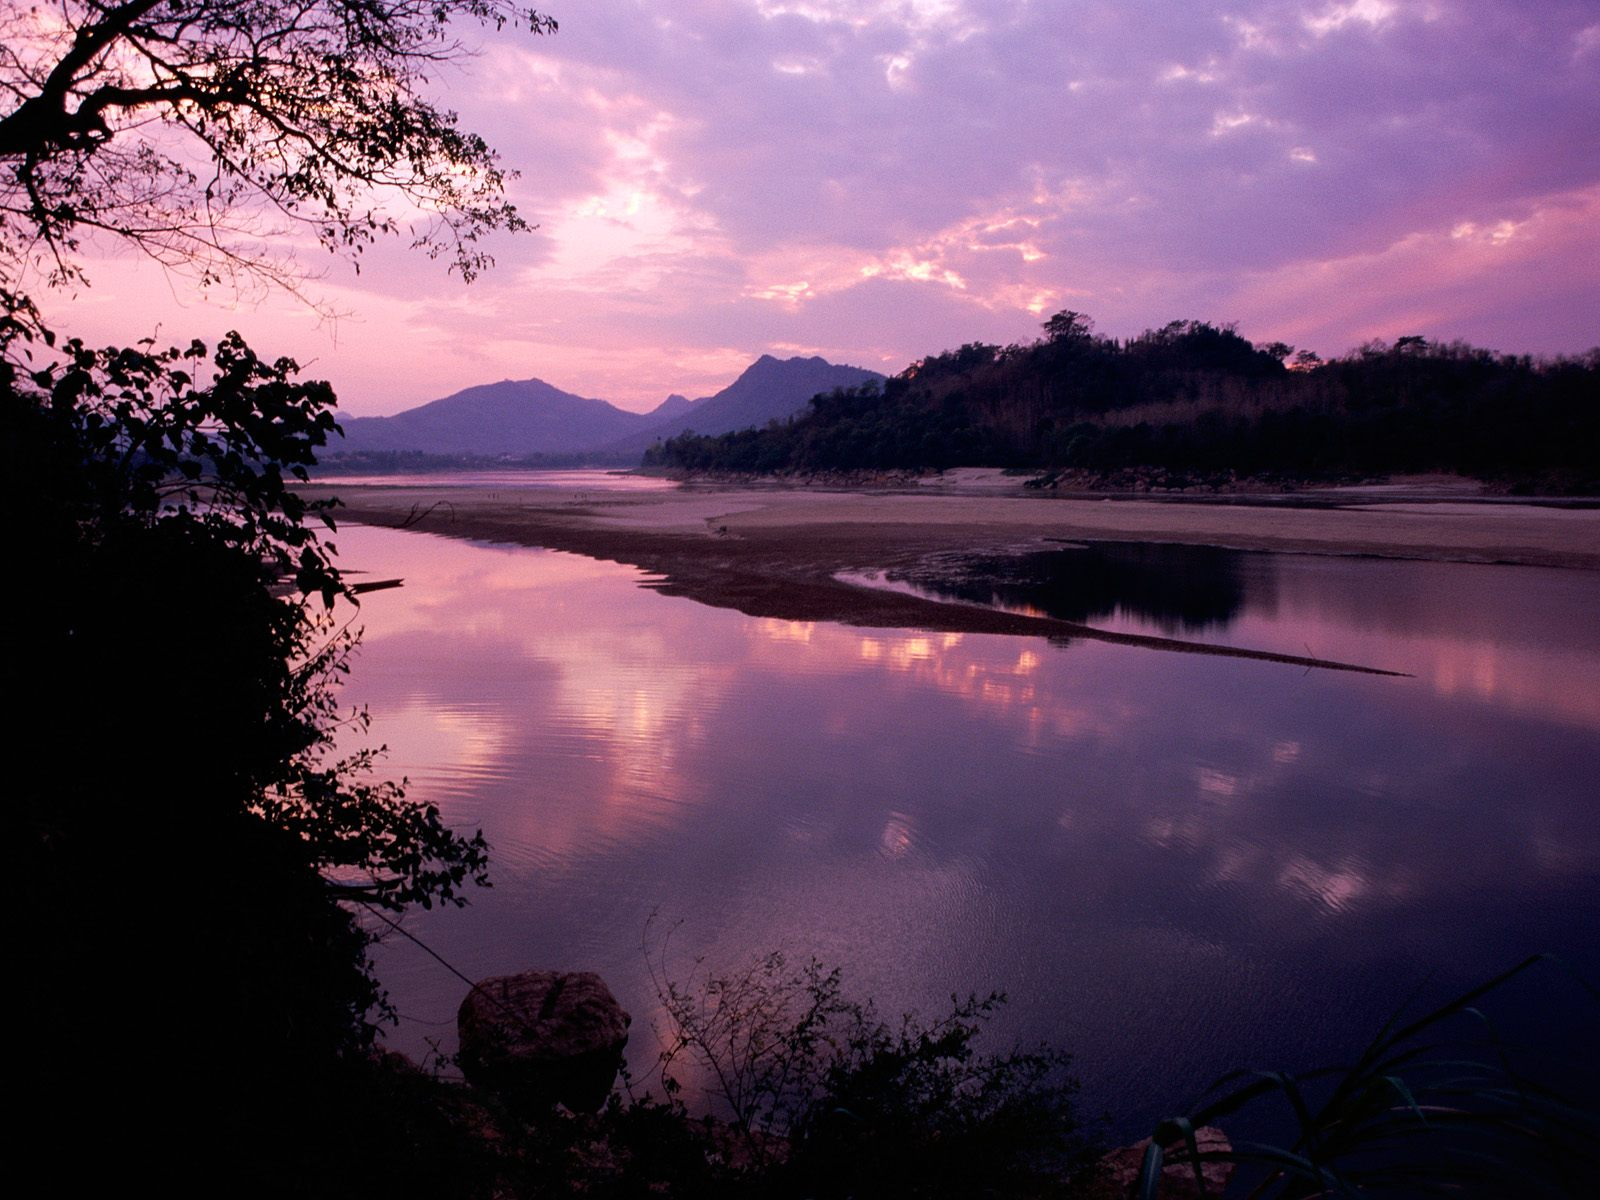 http://1.bp.blogspot.com/_ioD6UOQqcyA/Sw73HvEaMaI/AAAAAAAABc4/wVj6O44-tC8/s1600/Khan+River,+Luang+Prabang,+Laos.jpg